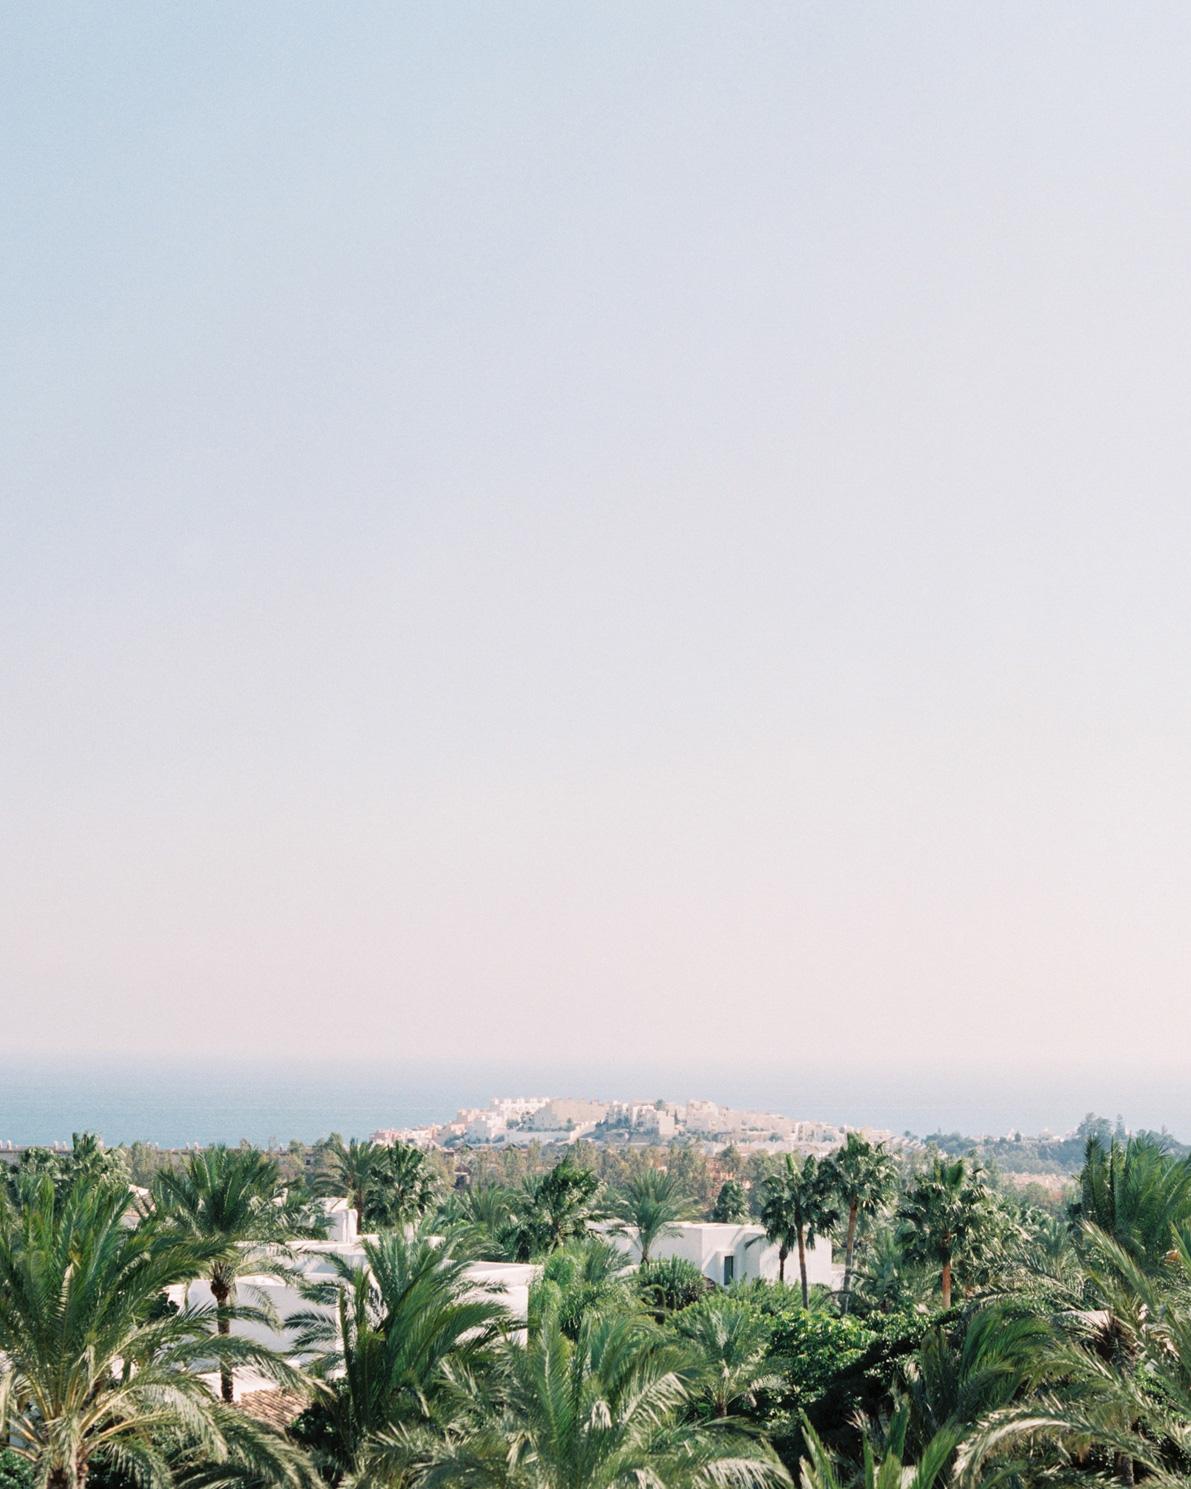 wedding location views